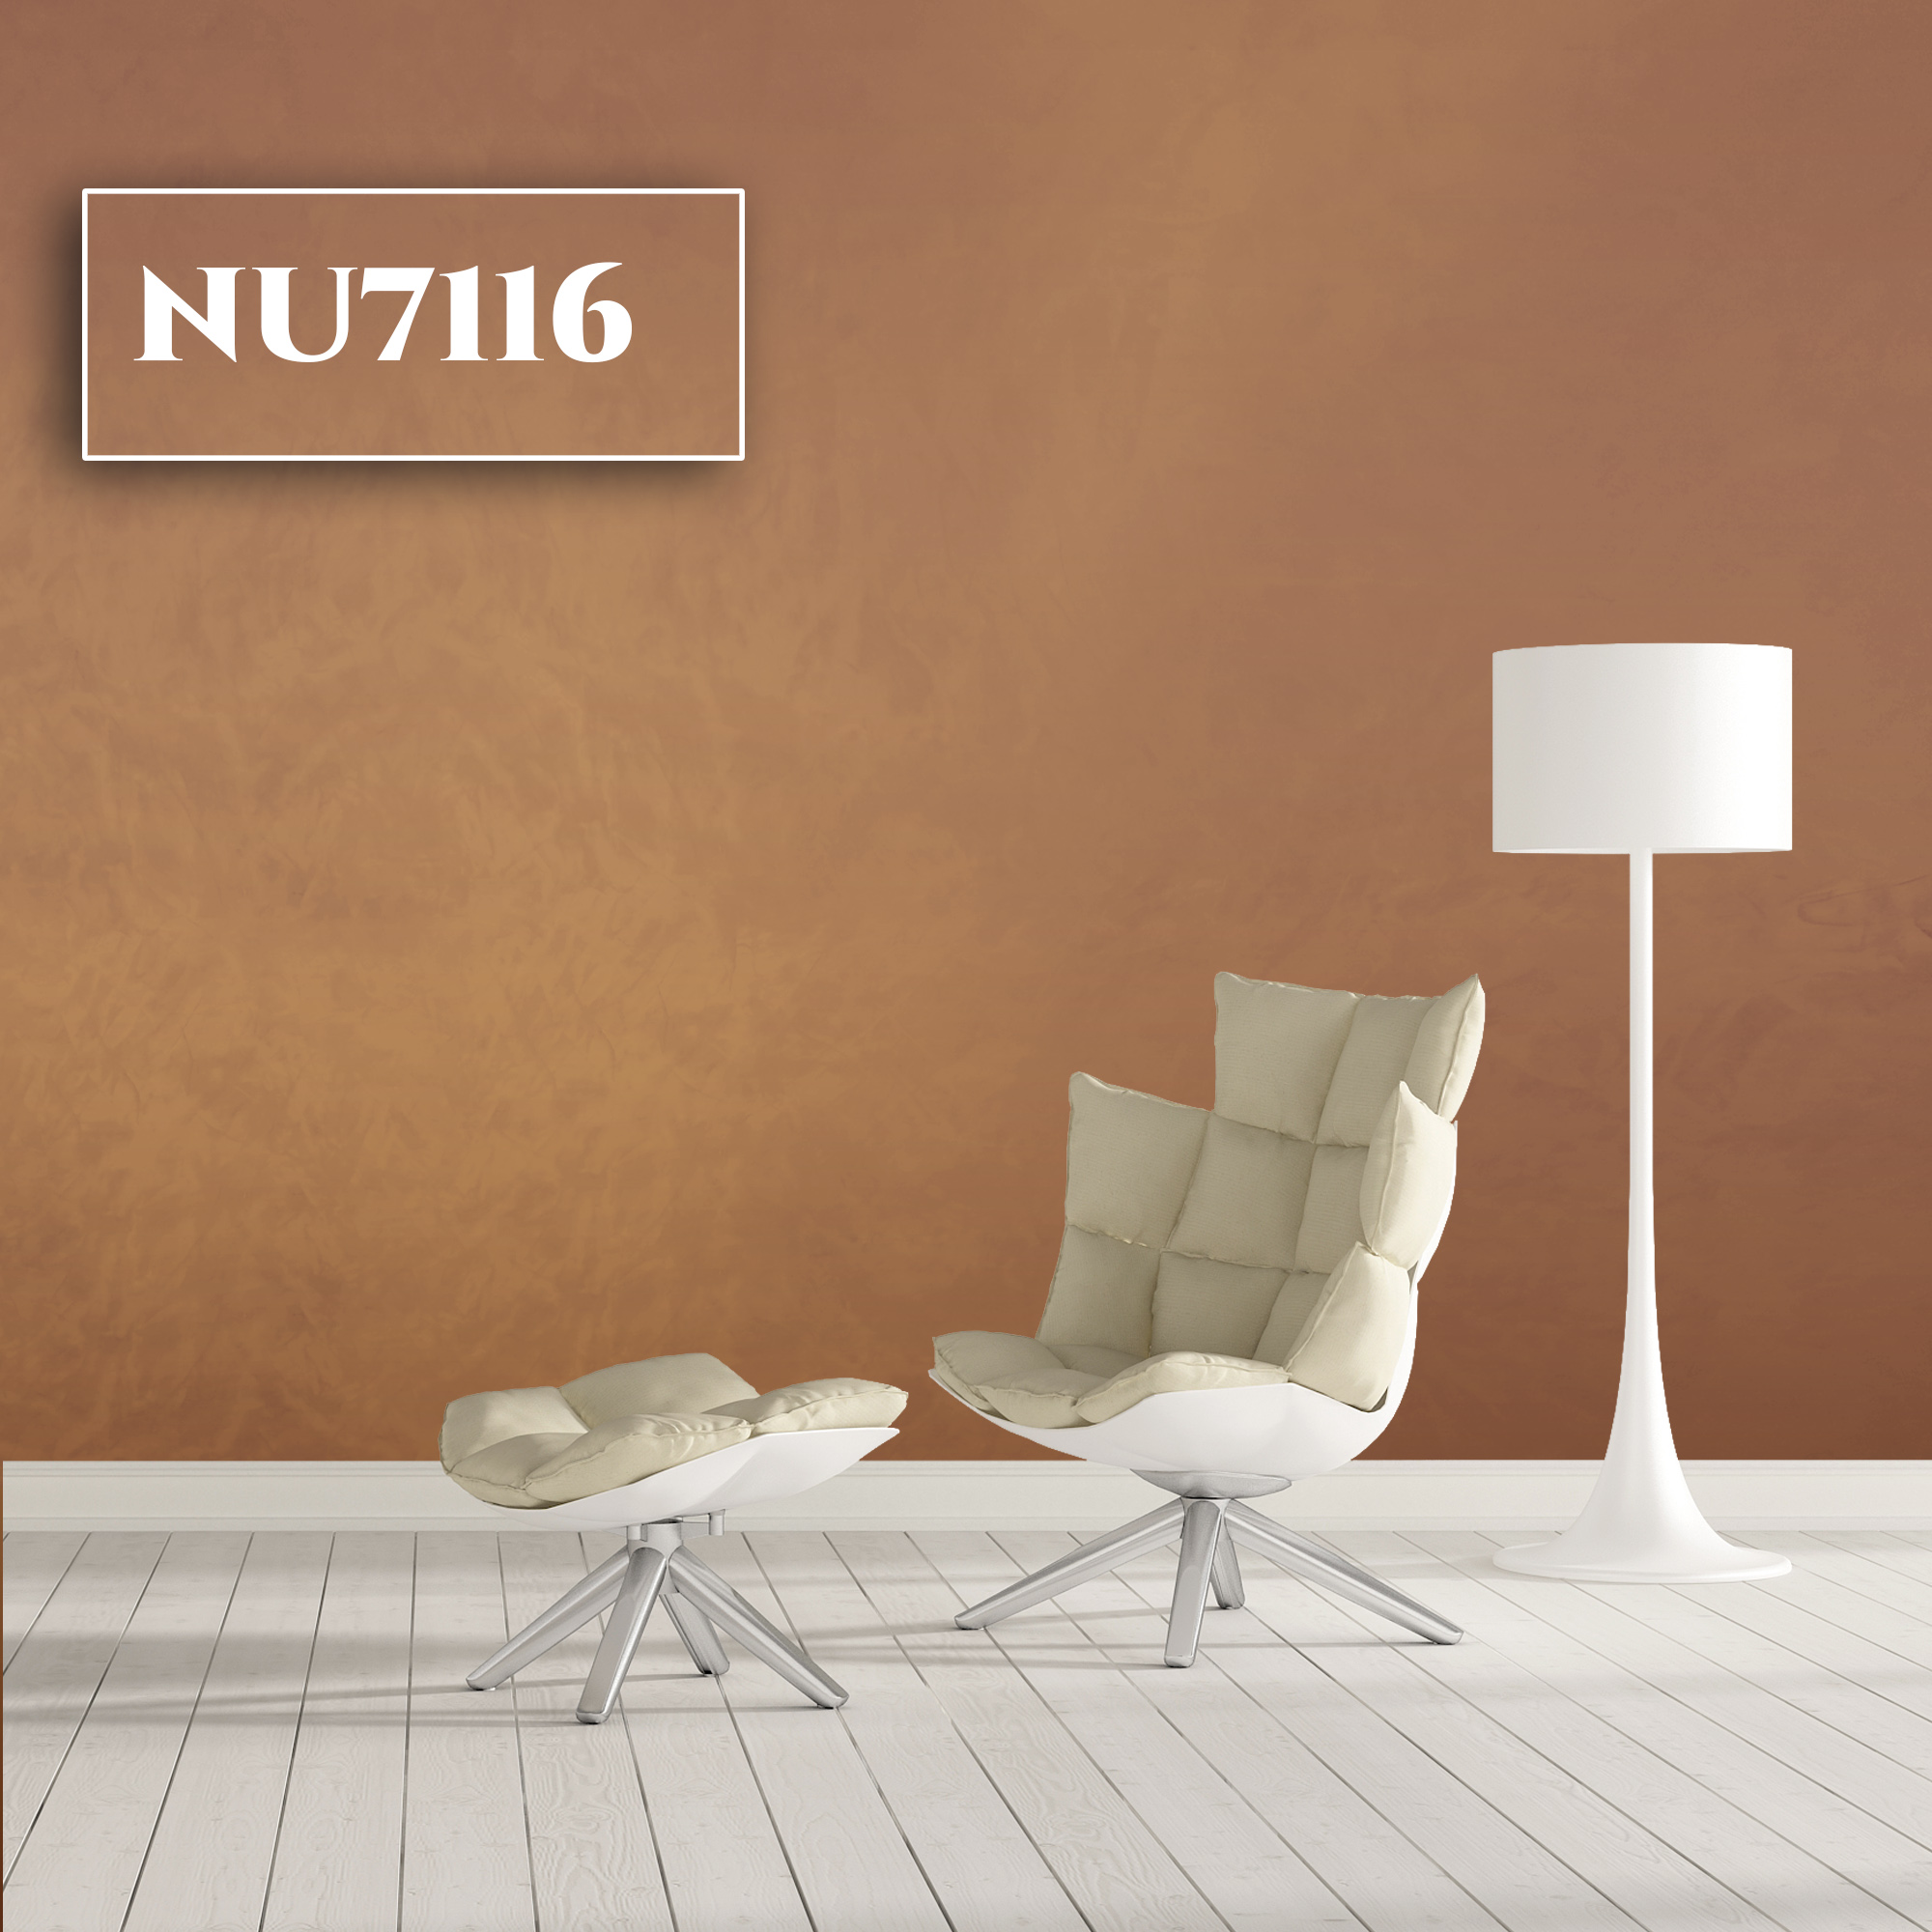 NU7116